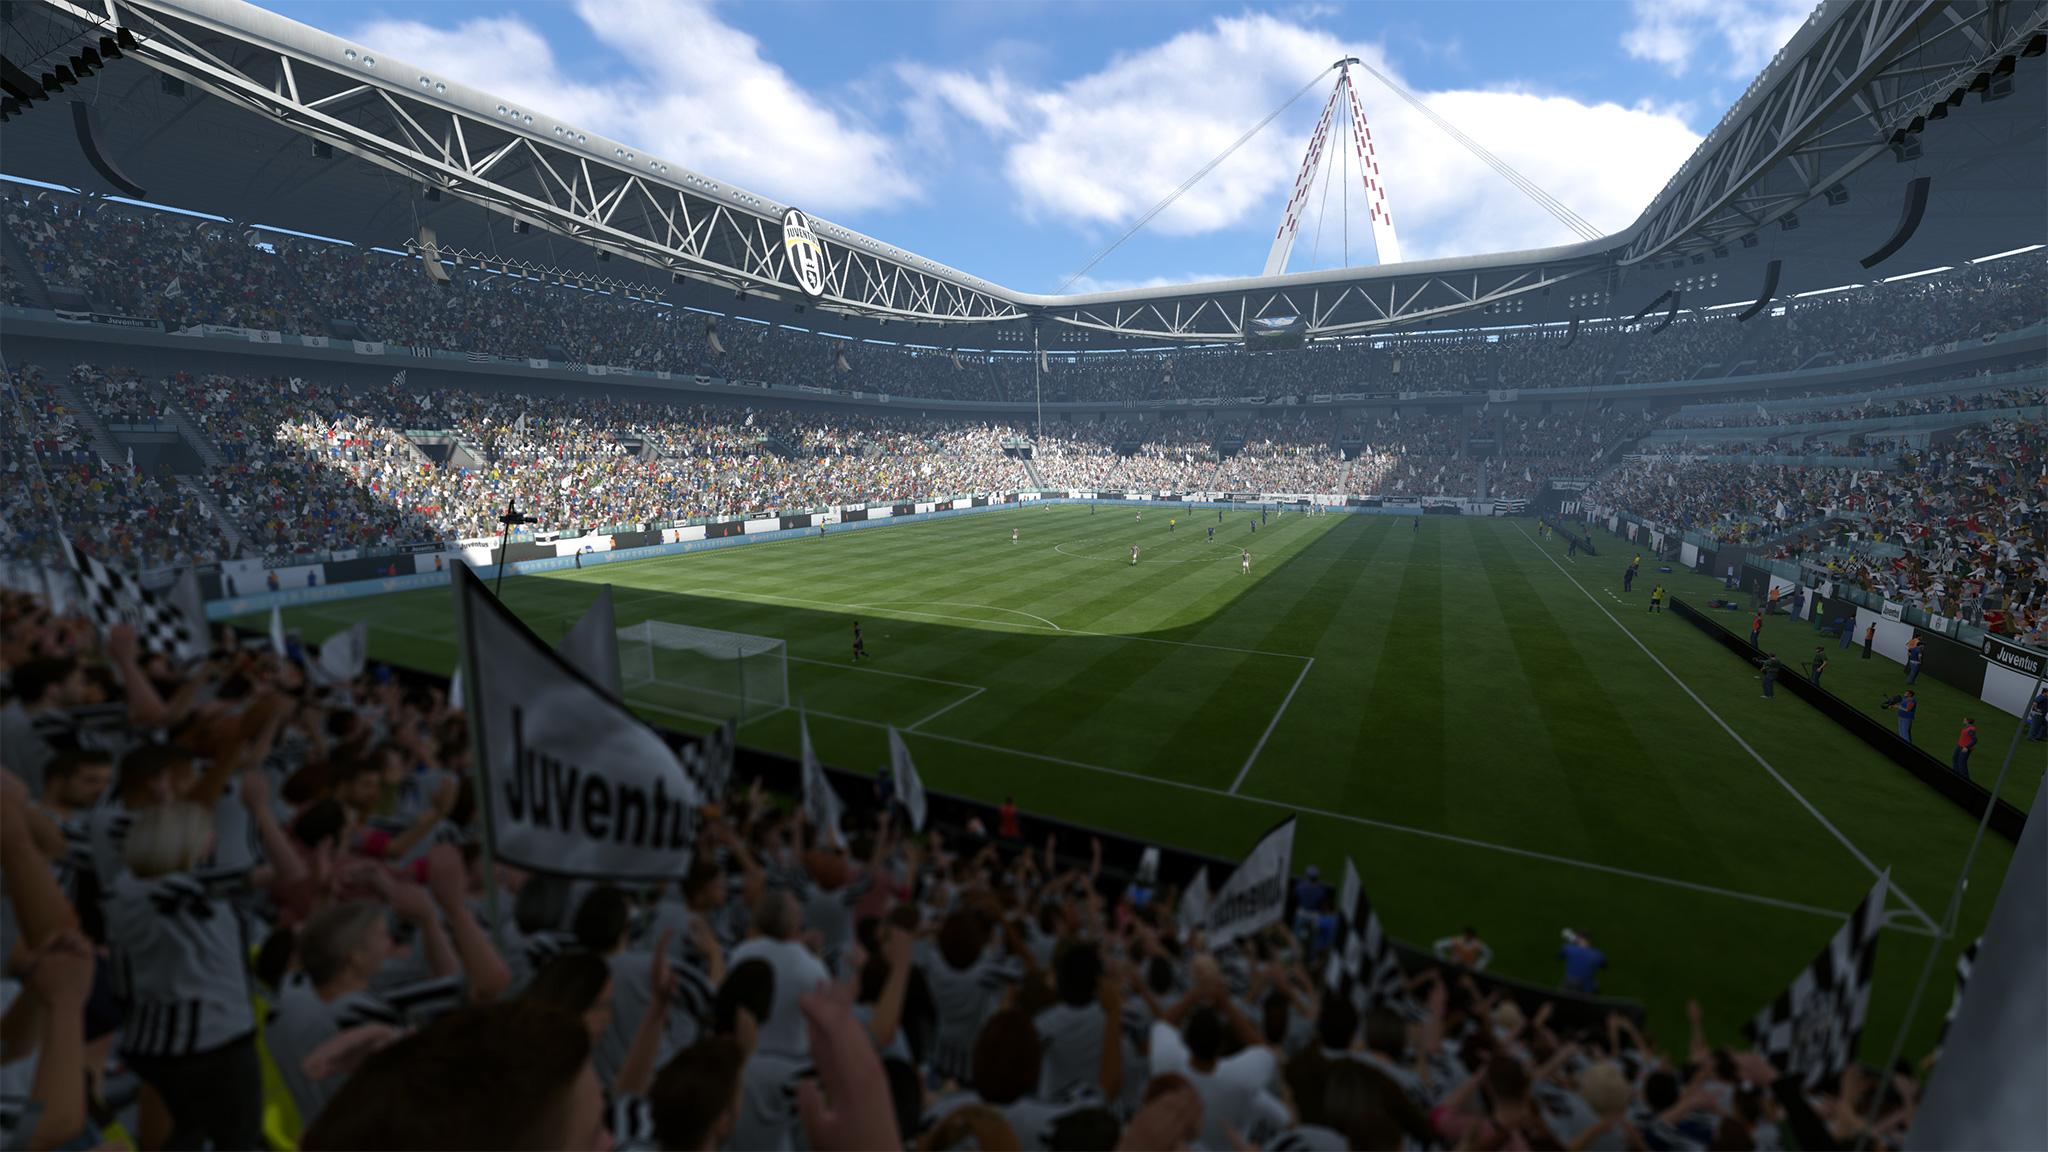 juv-stadium-fifa-17